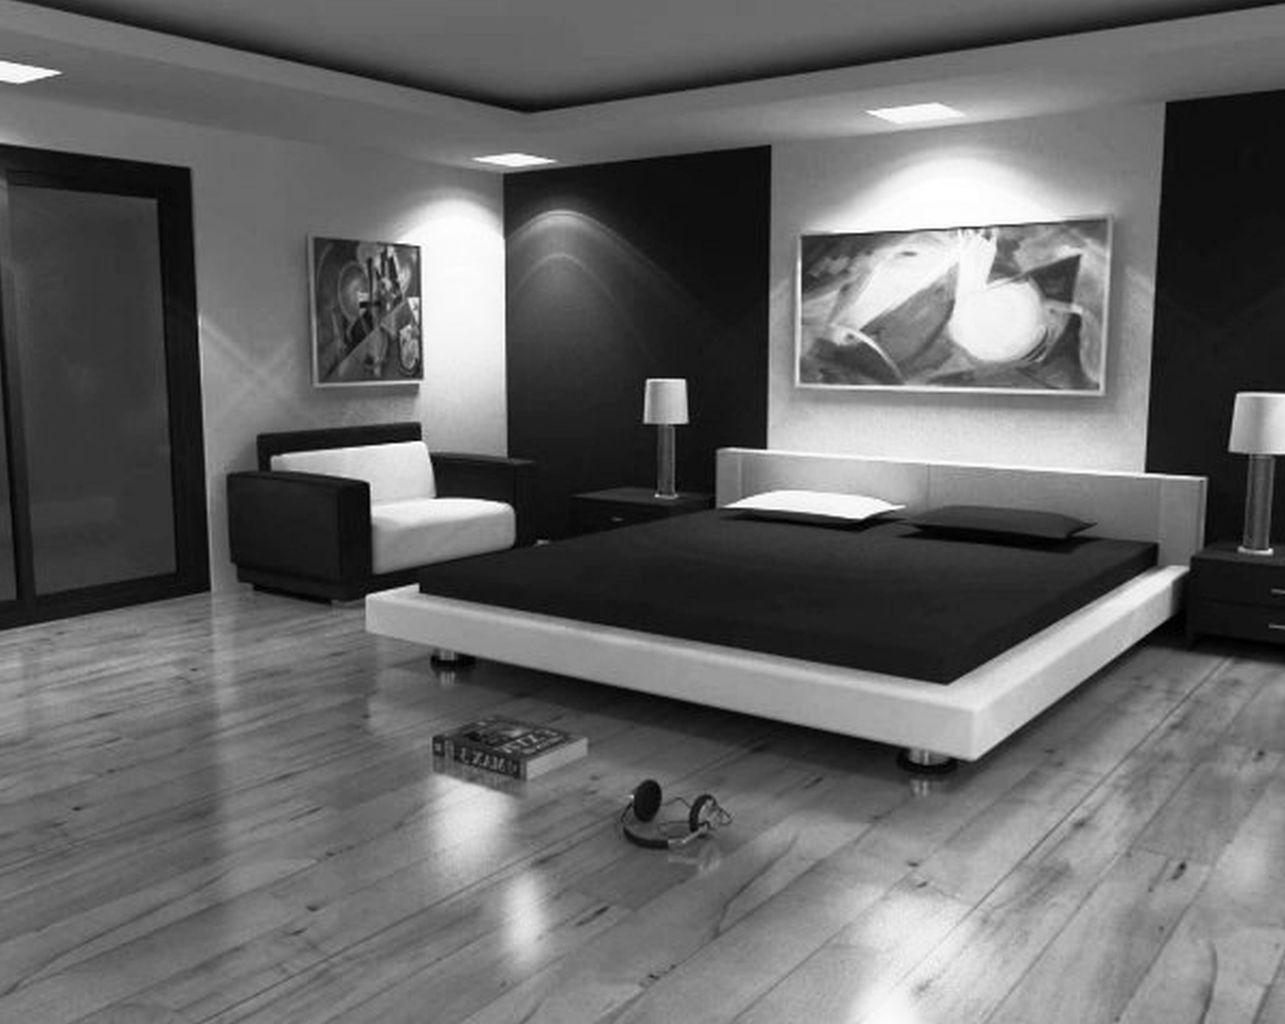 46 Casual Black And White Design Ideas For Interior ...